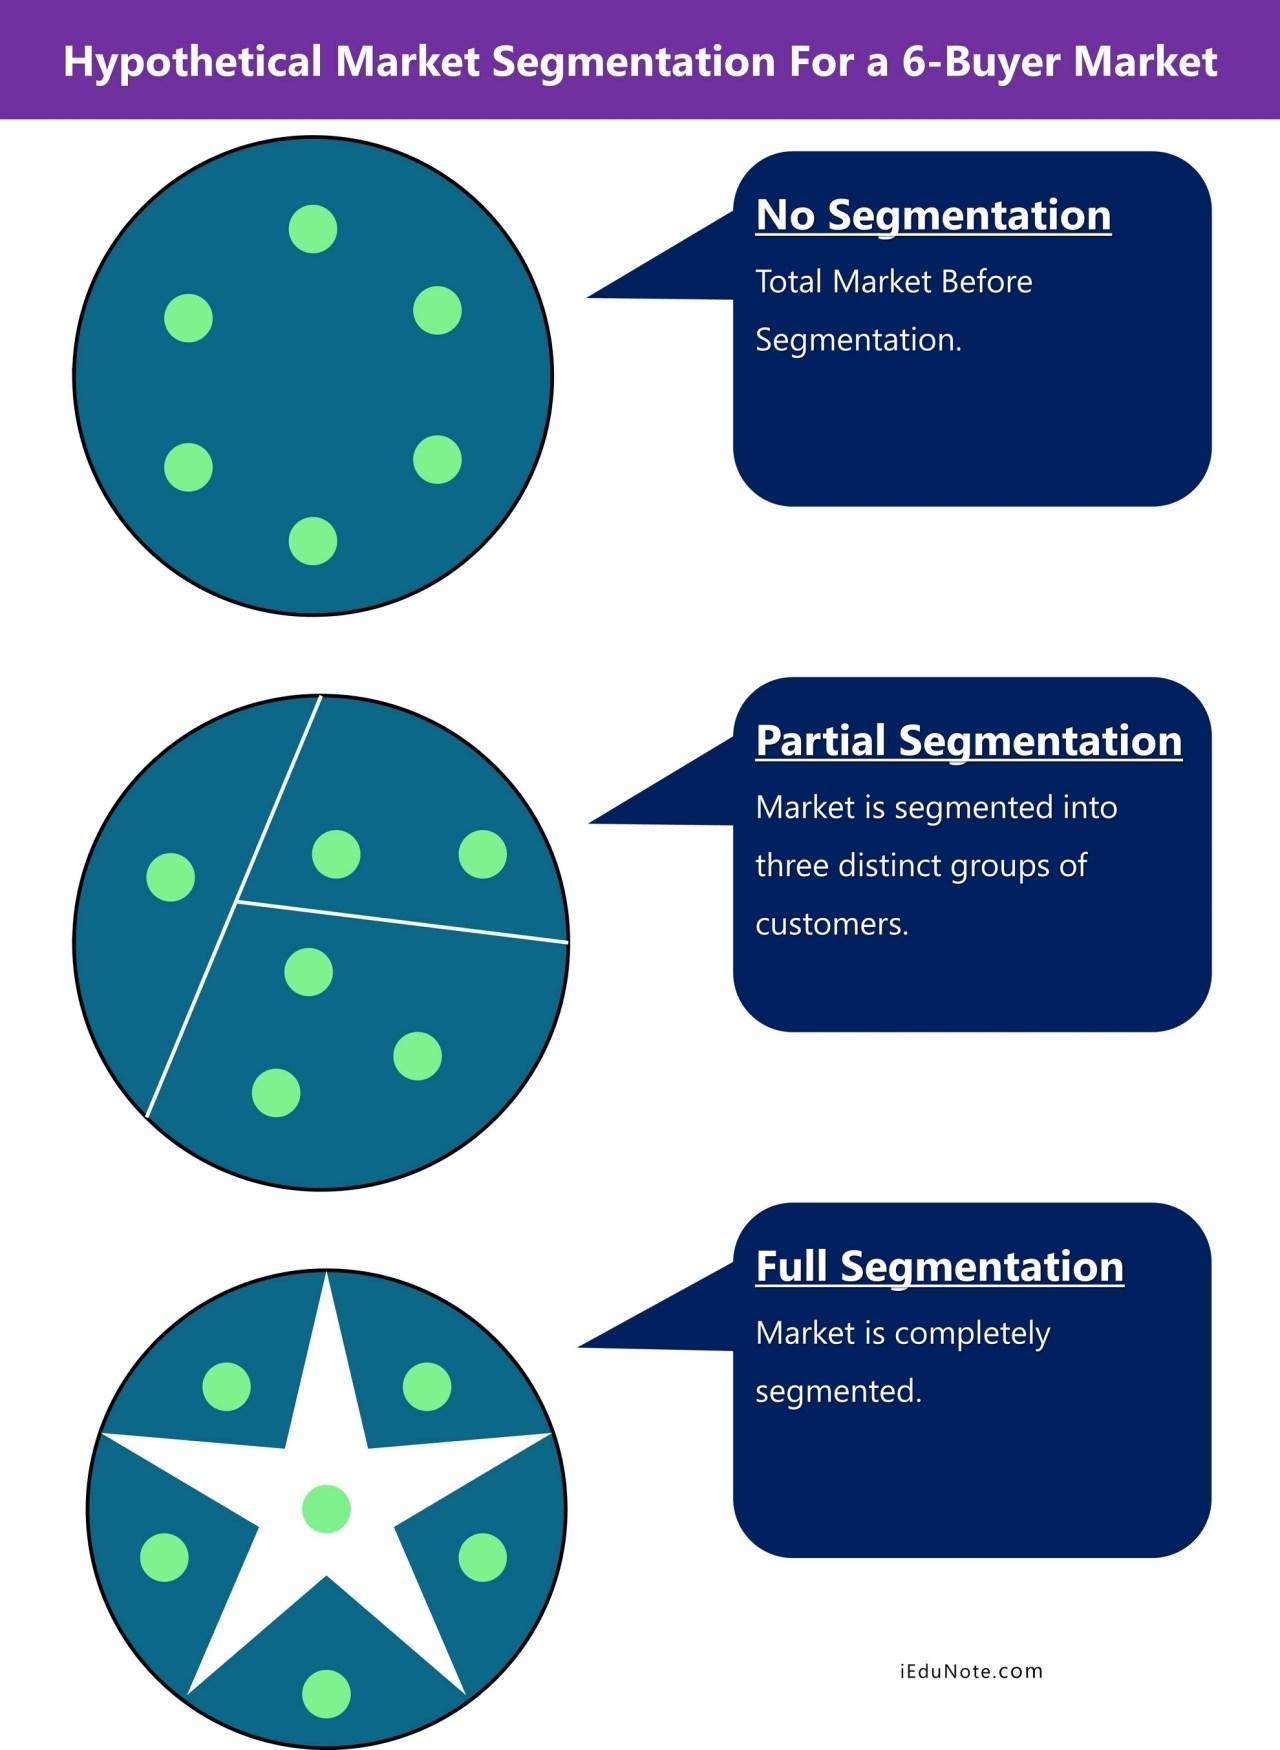 hypothetical market segmentation for a 6-buyer market